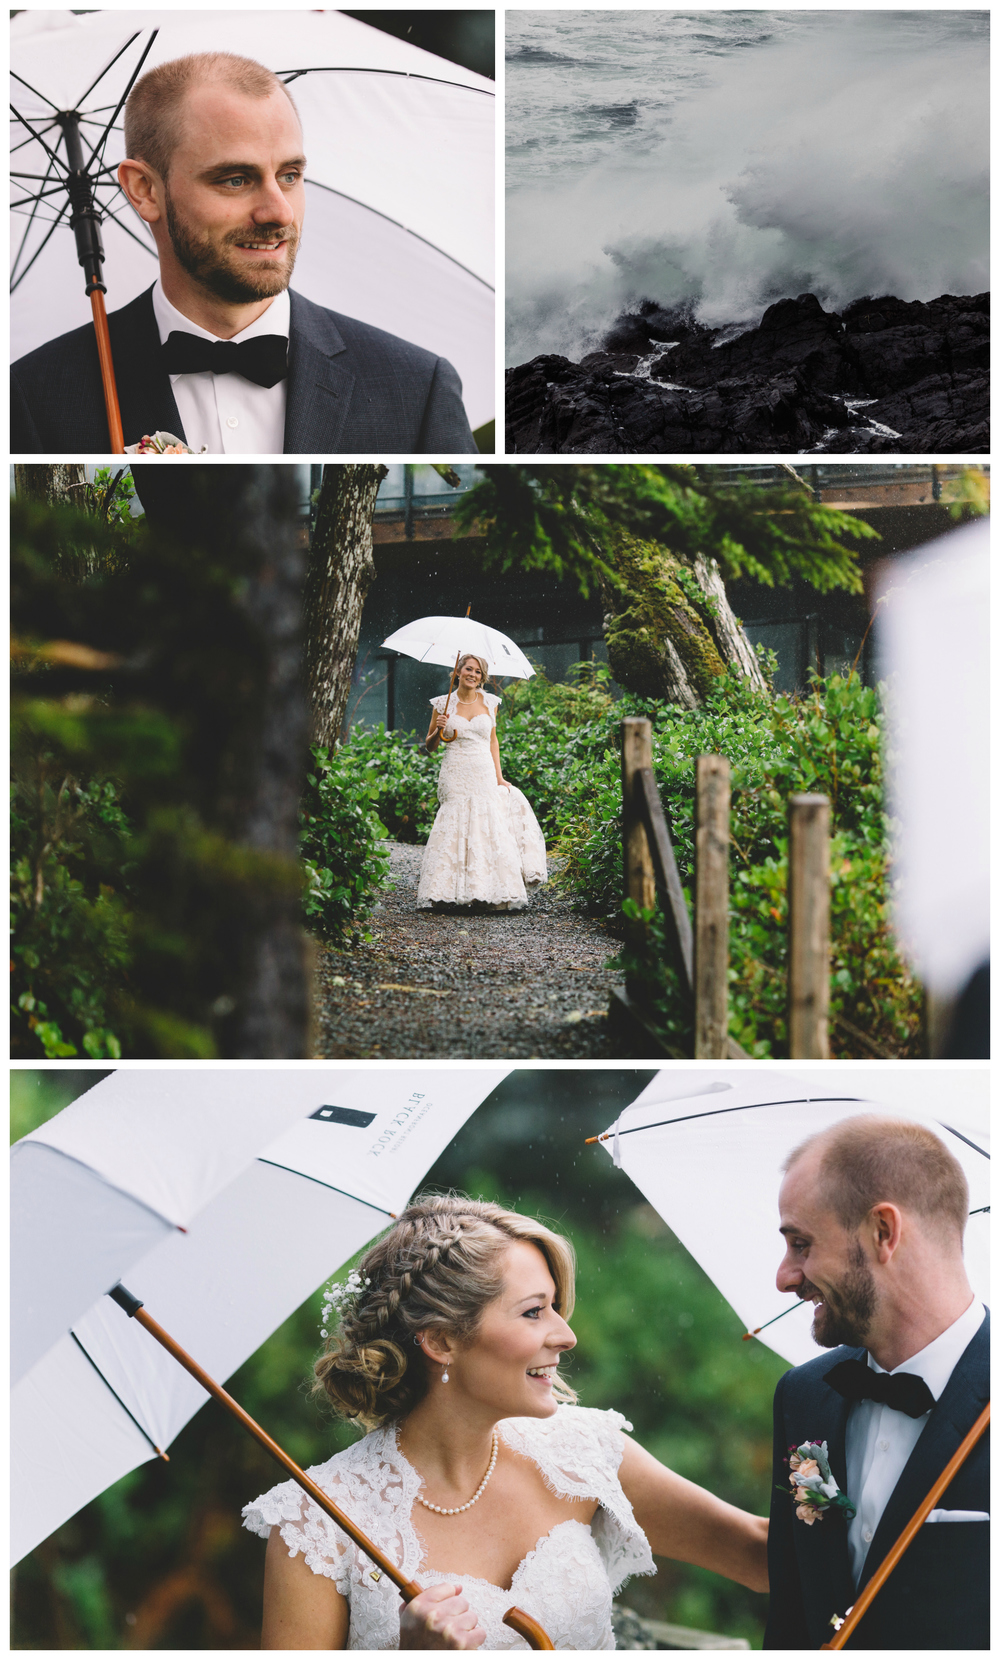 frick-wedding-5.jpg